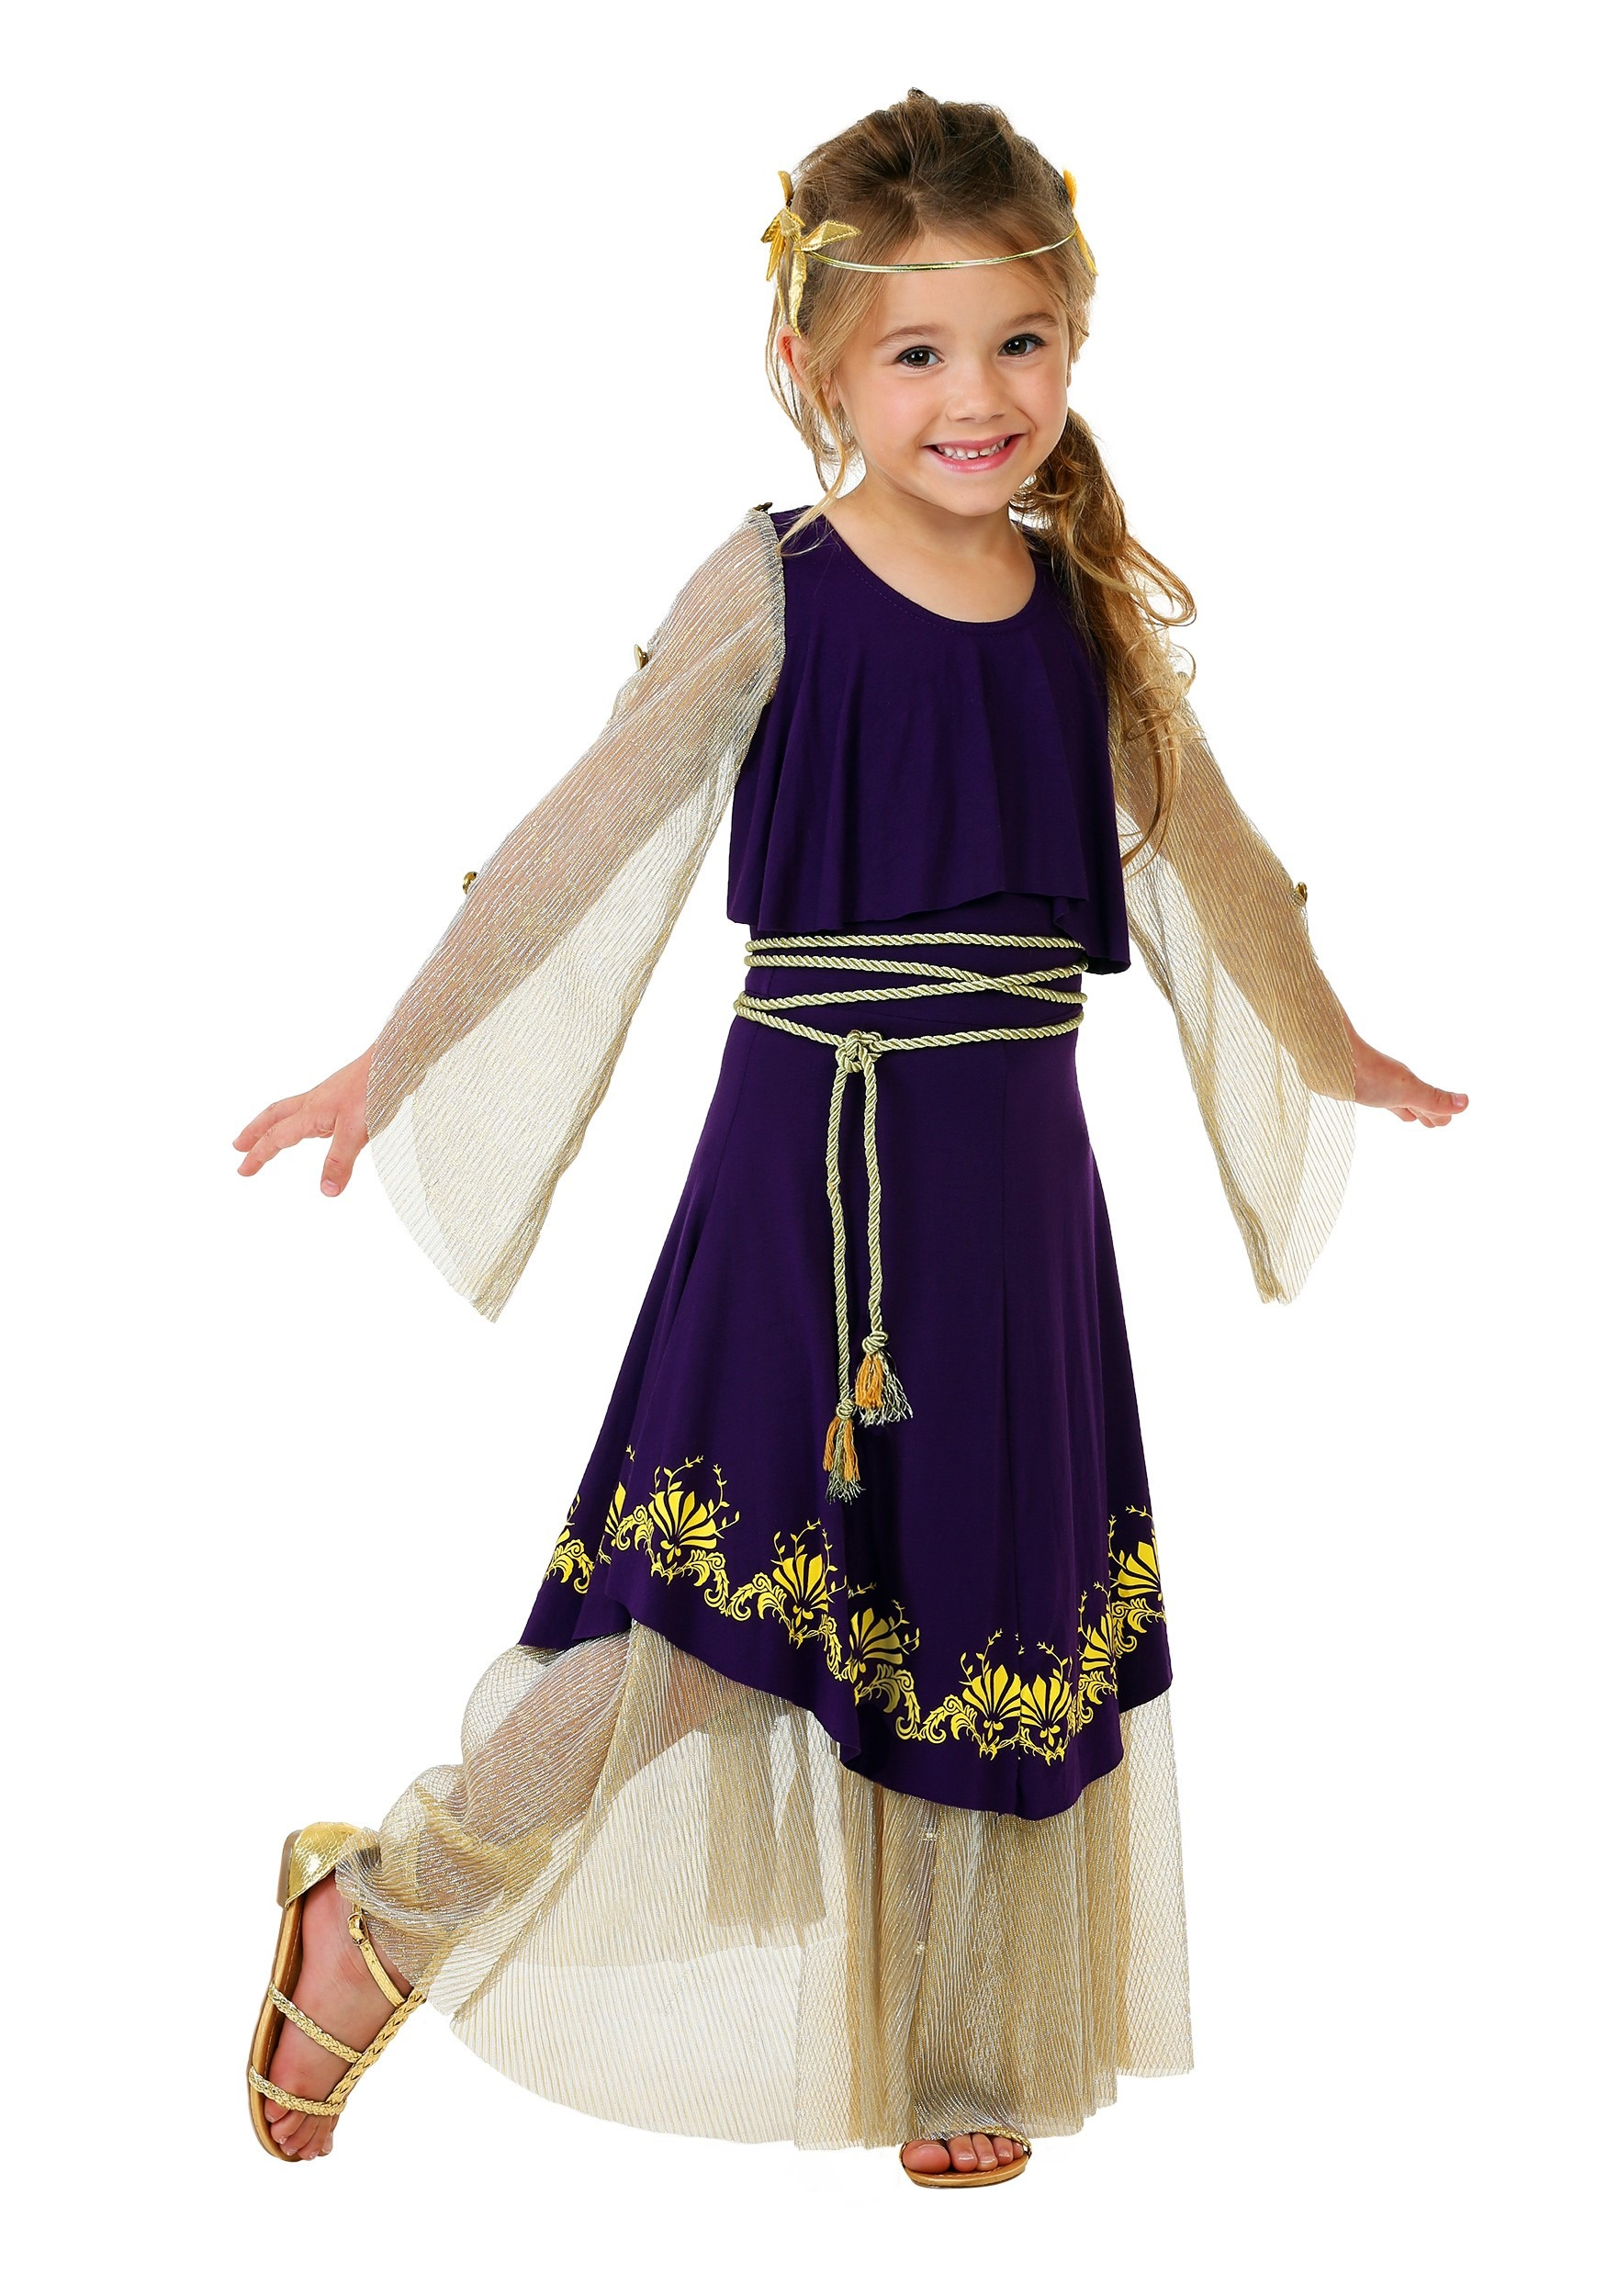 Toddler Aphrodite Goddess Costume